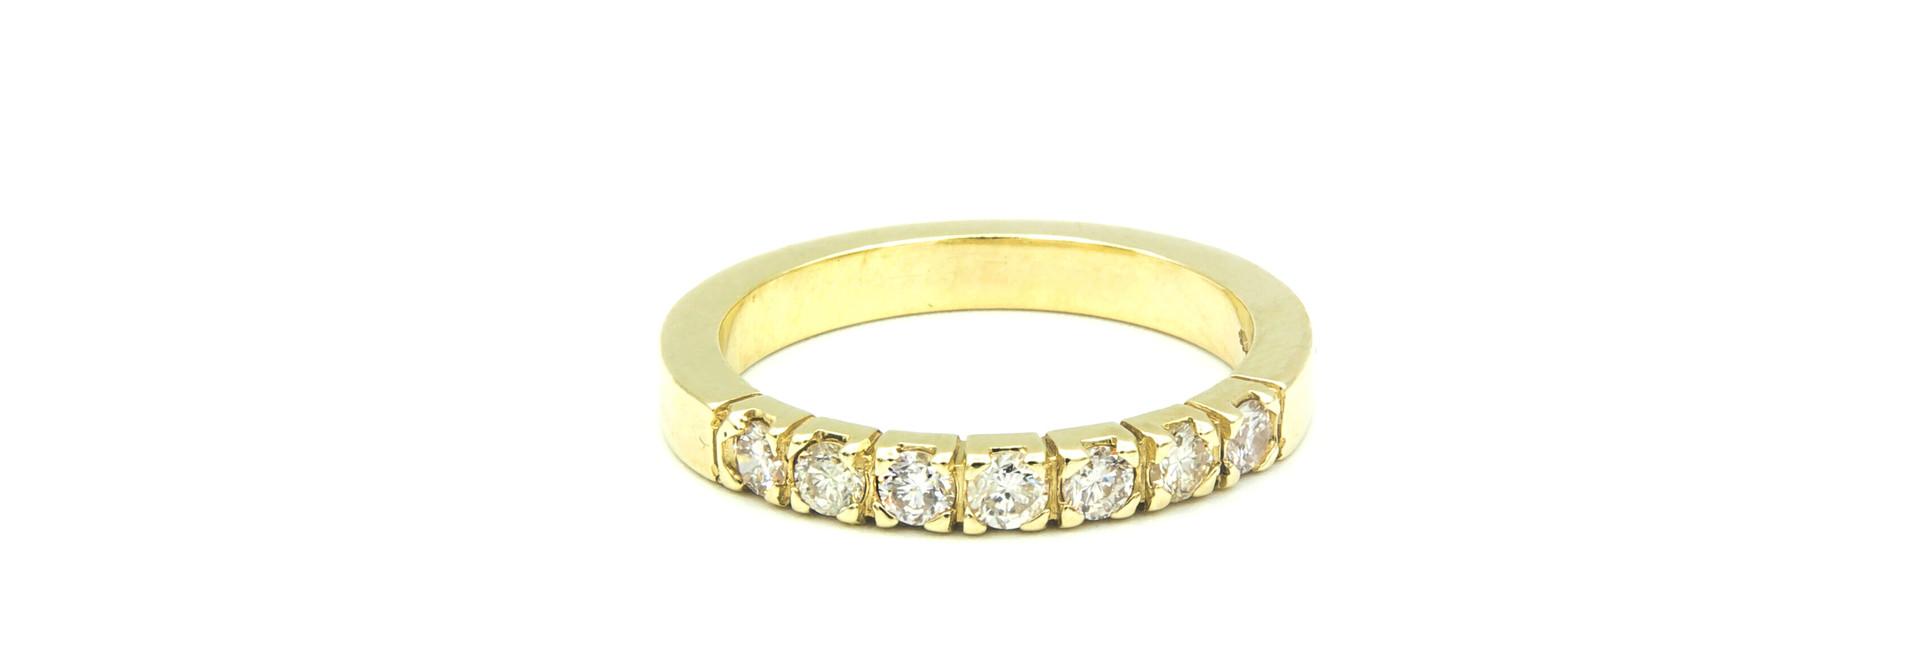 Ring verlovingsring klassiek met 7 diamanten ingezet